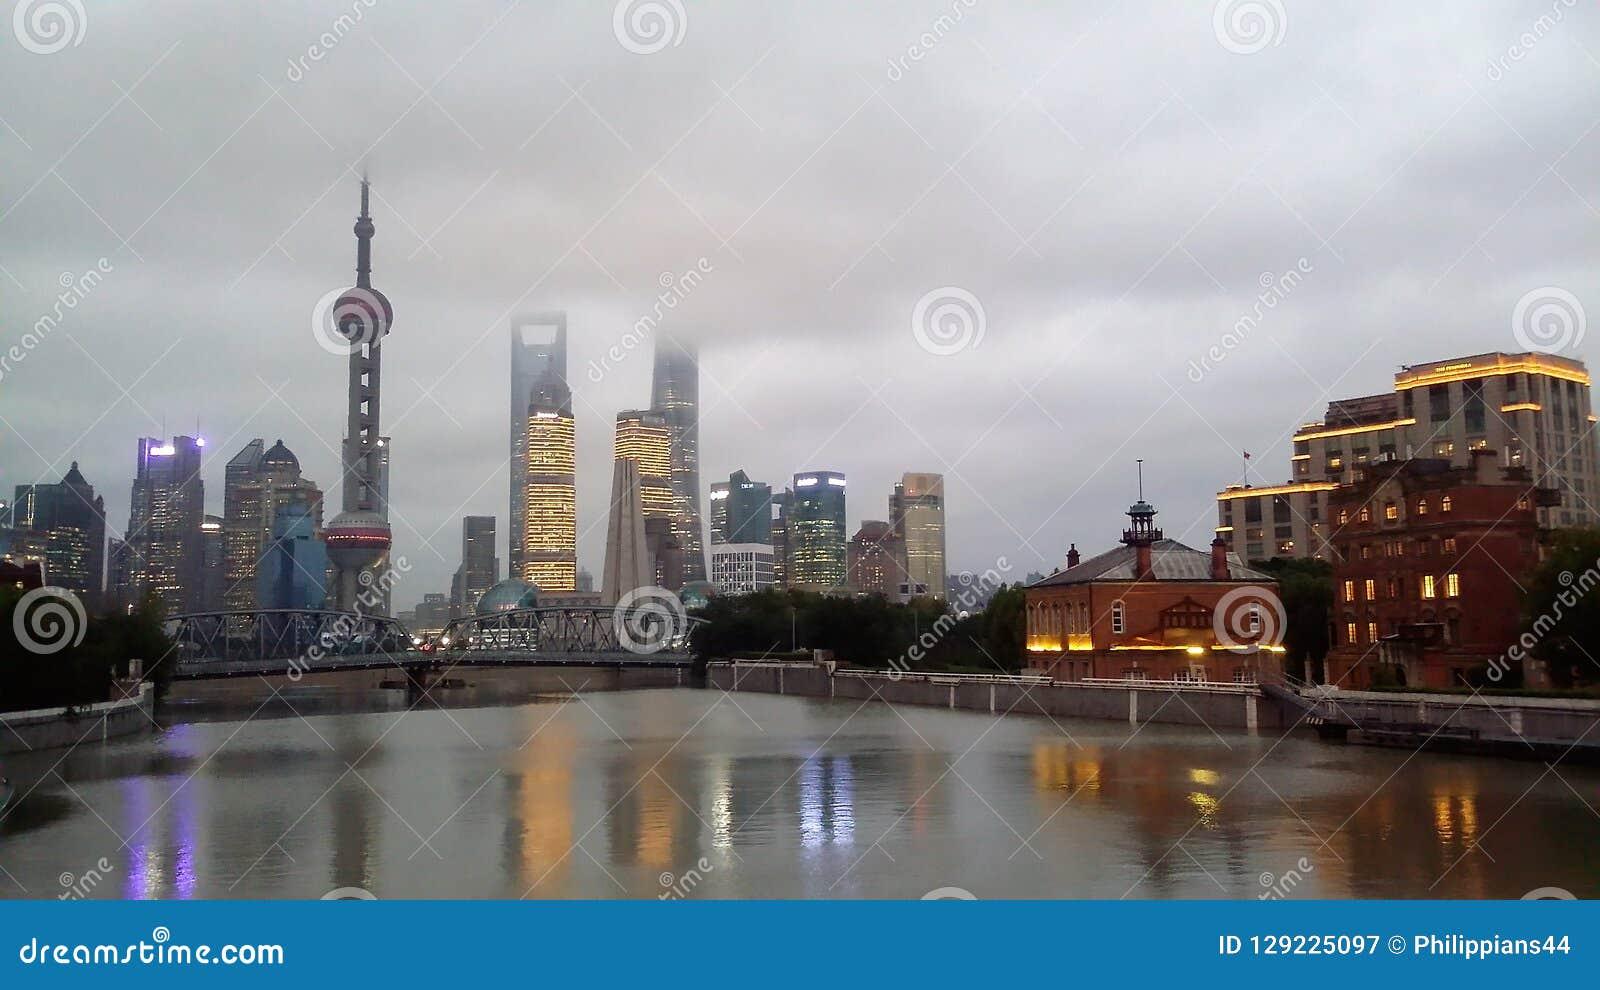 De stadshorizon van Shanghai, China op de Huangpu-Rivier